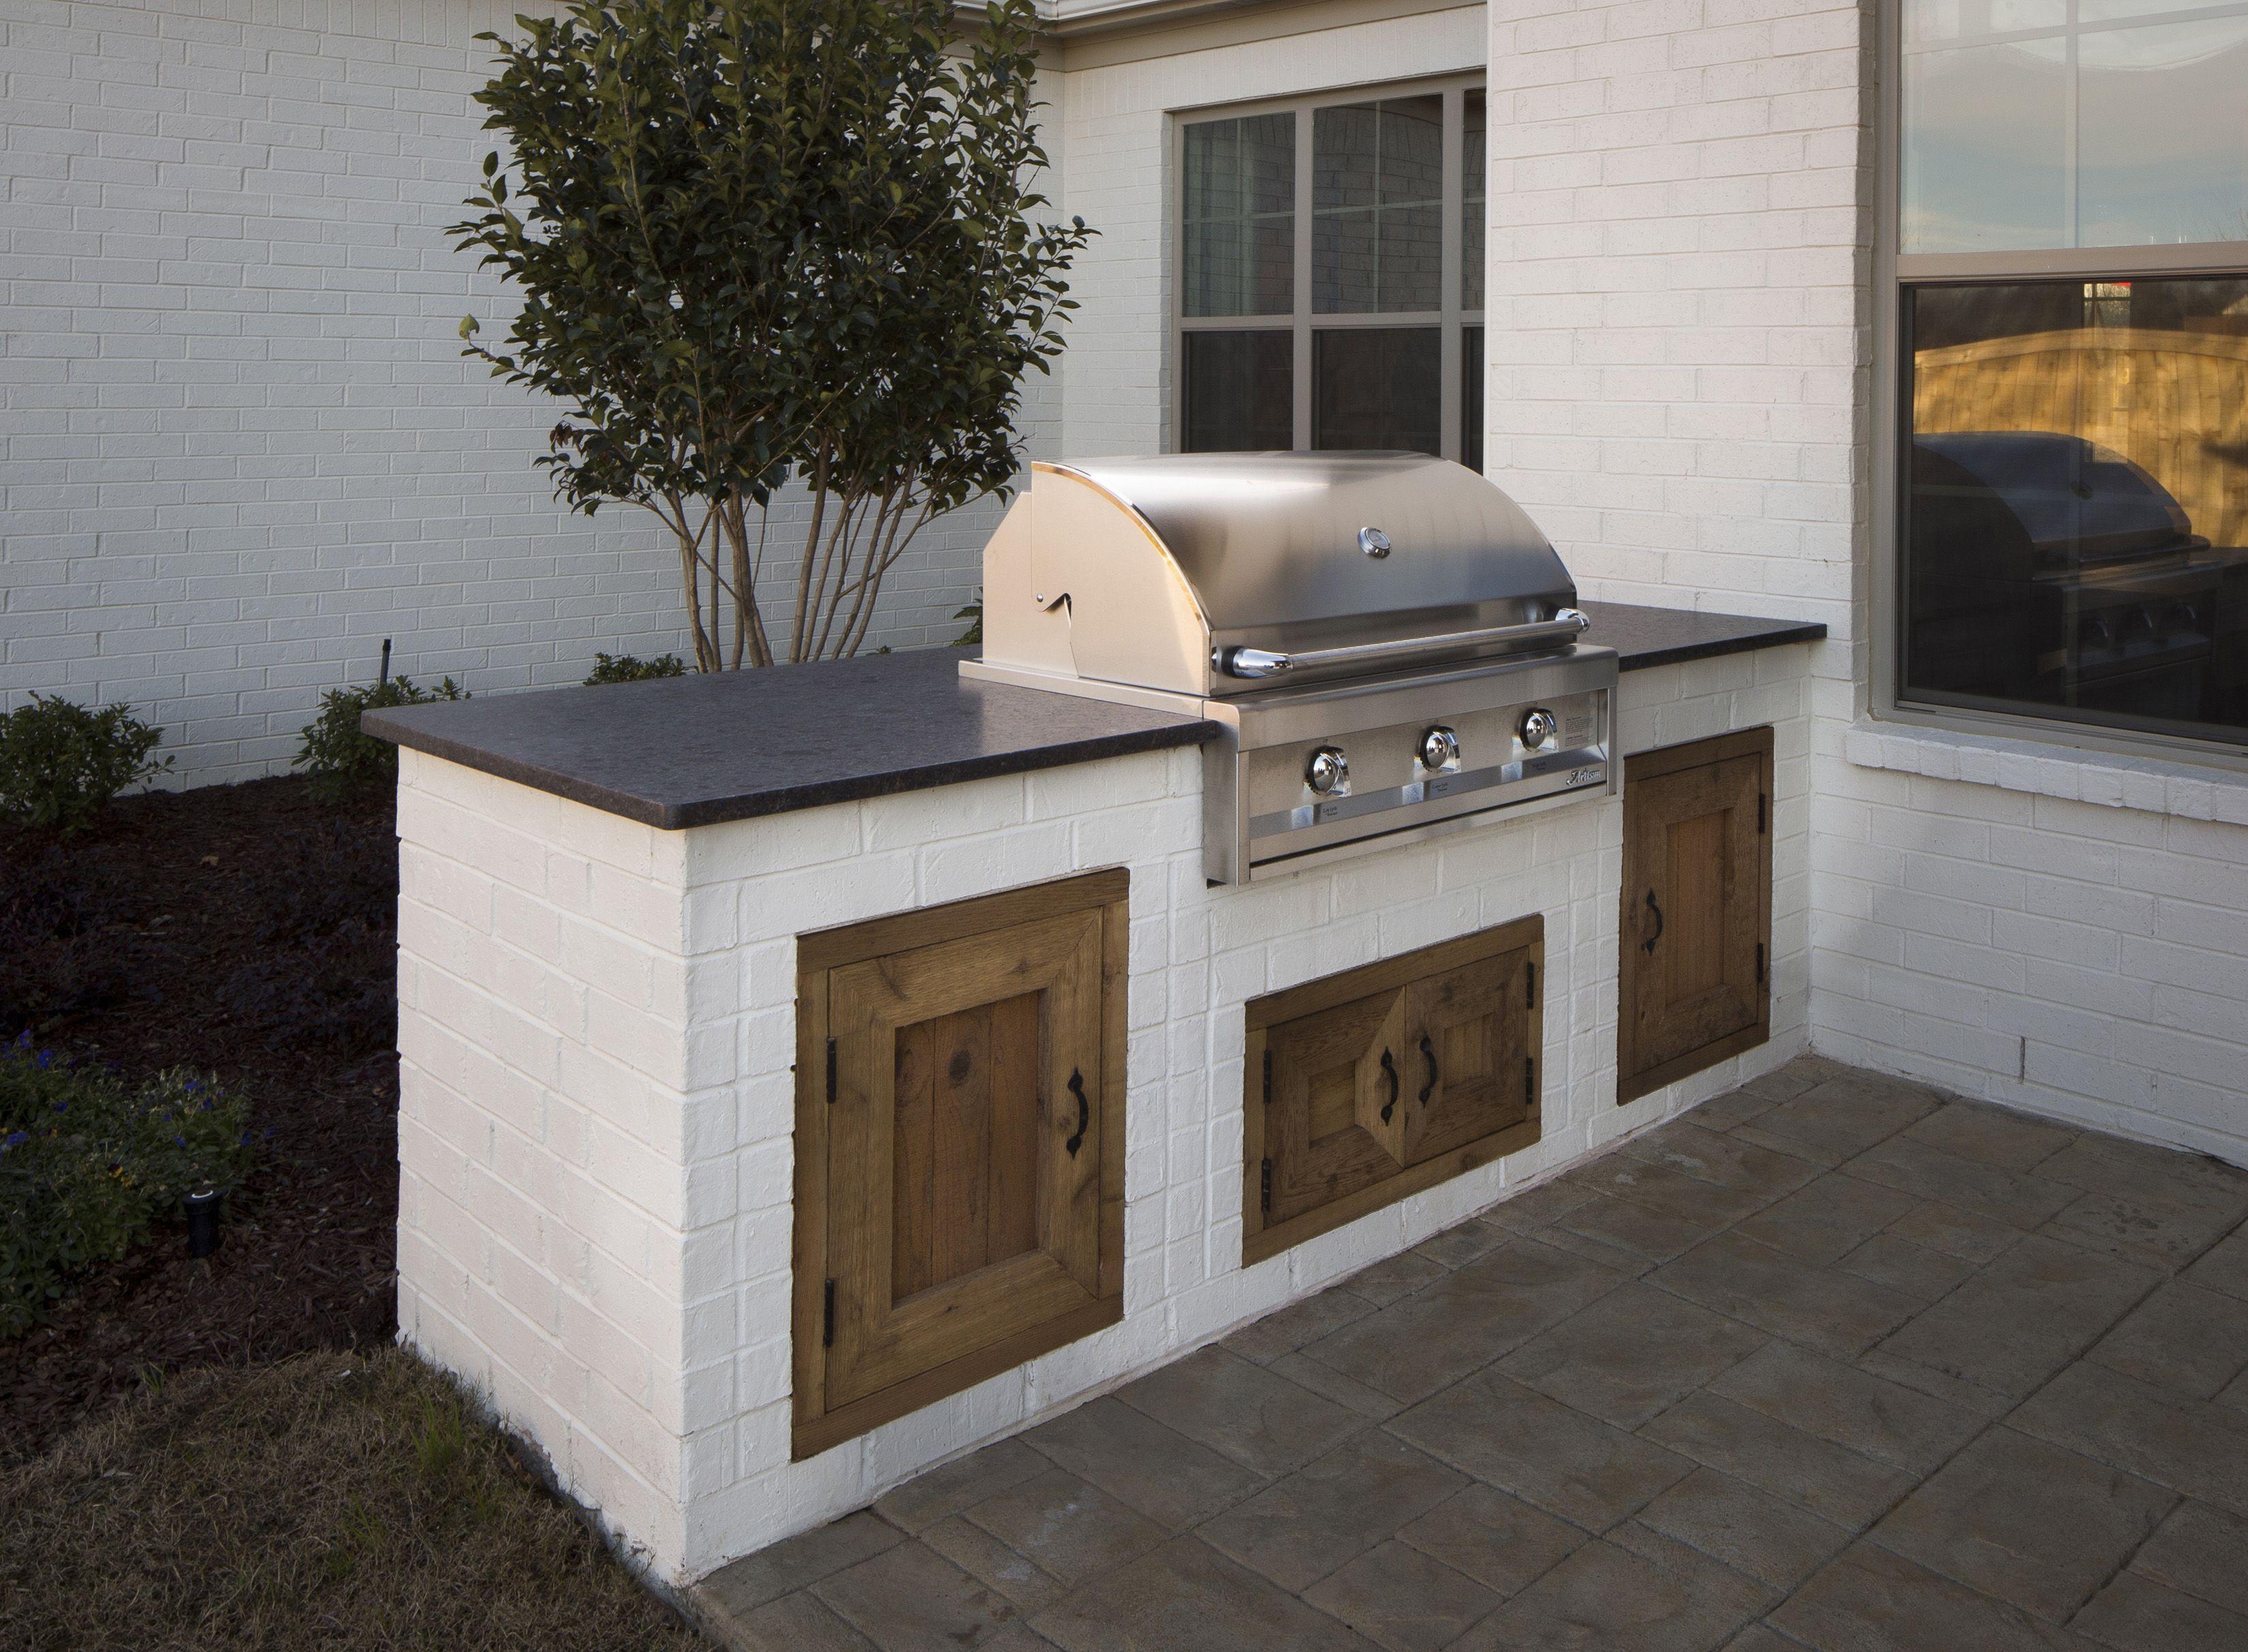 Regency Homebuilders Outdoor Living Area With Grilling Station Outdoor Grill Station Outdoor Fireplace Designs Outdoor Fire Pit